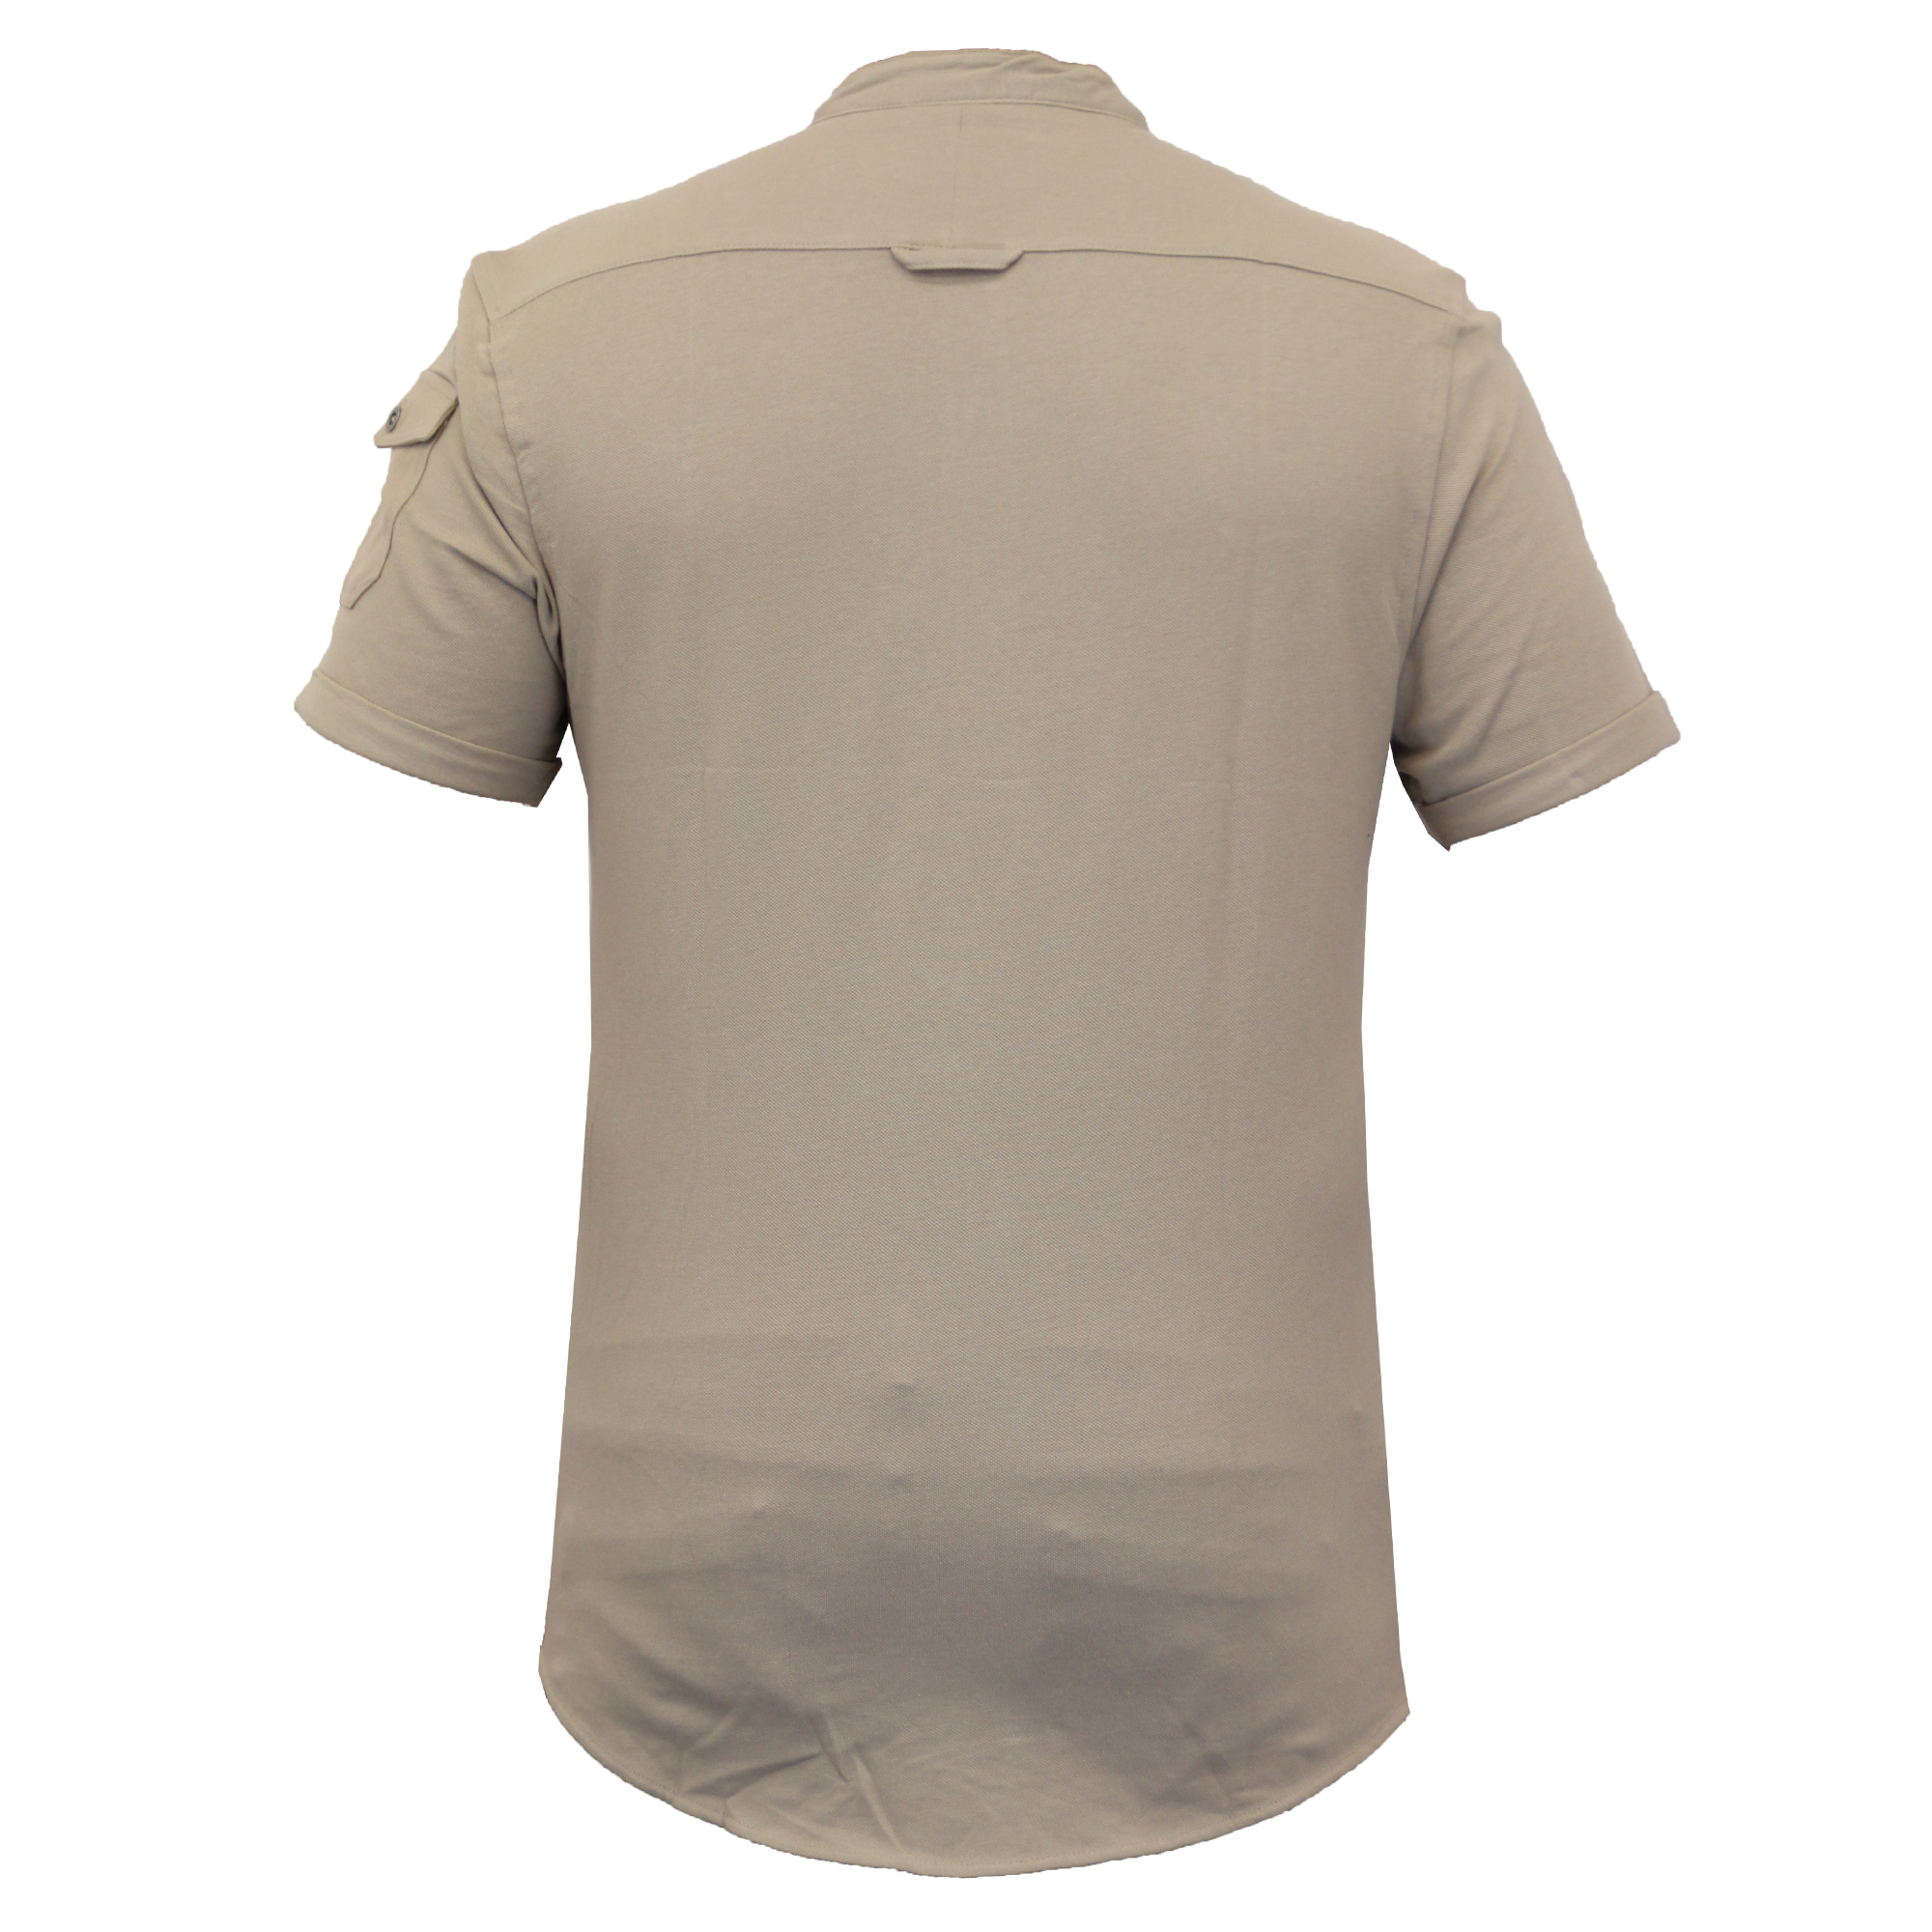 Mens-Linen-Shirt-Threadbare-Short-Sleeved-Brave-Soul-Collared-Casual-Summer-New thumbnail 14